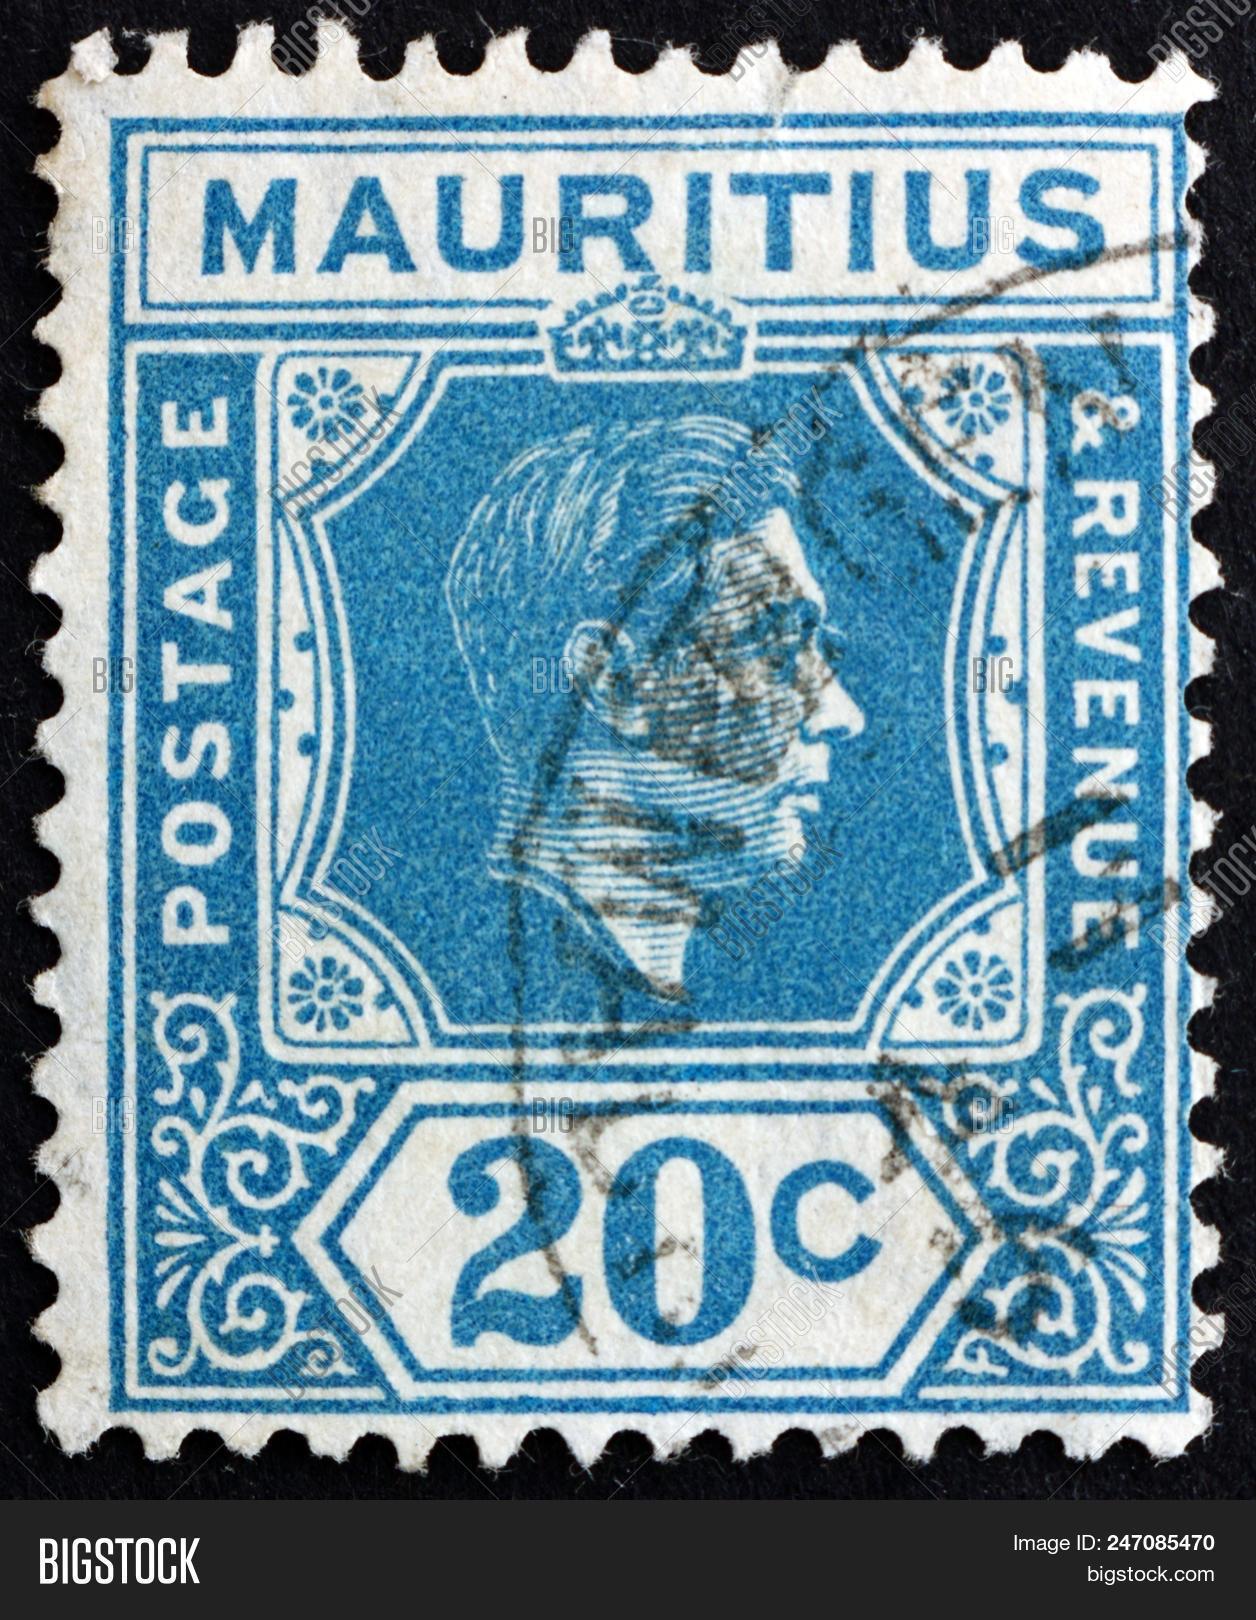 Mauritius - Circa 1938 Image & Photo (Free Trial) | Bigstock